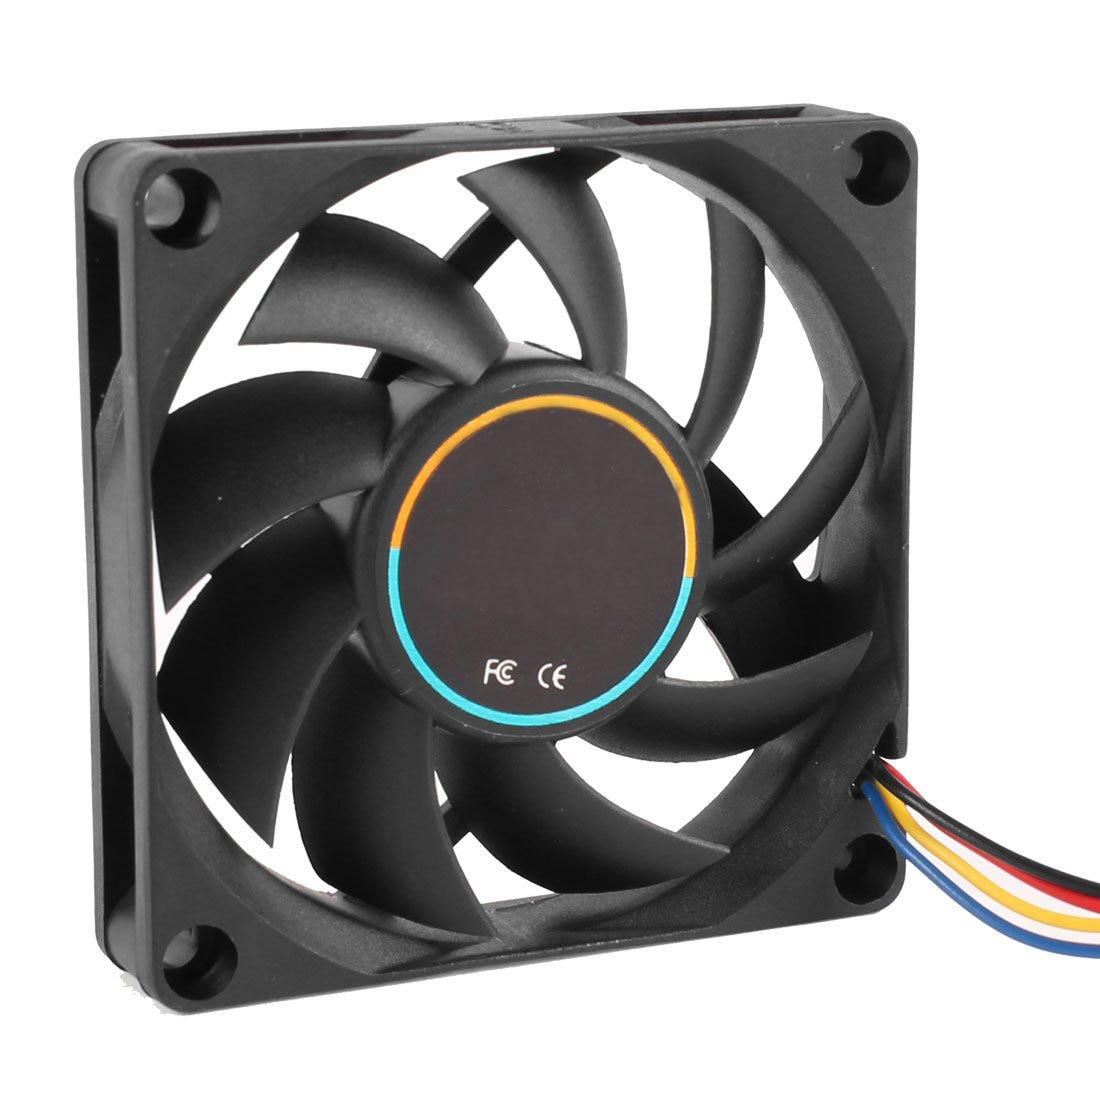 GTFS Hot 70mmx15mm 12V 4 Pins PWM PC Computer Case CPU Cooler Cooling Fan Black aerocool 15 blade 1 56w mute model computer cpu cooling fan black 12 x 12cm 7v